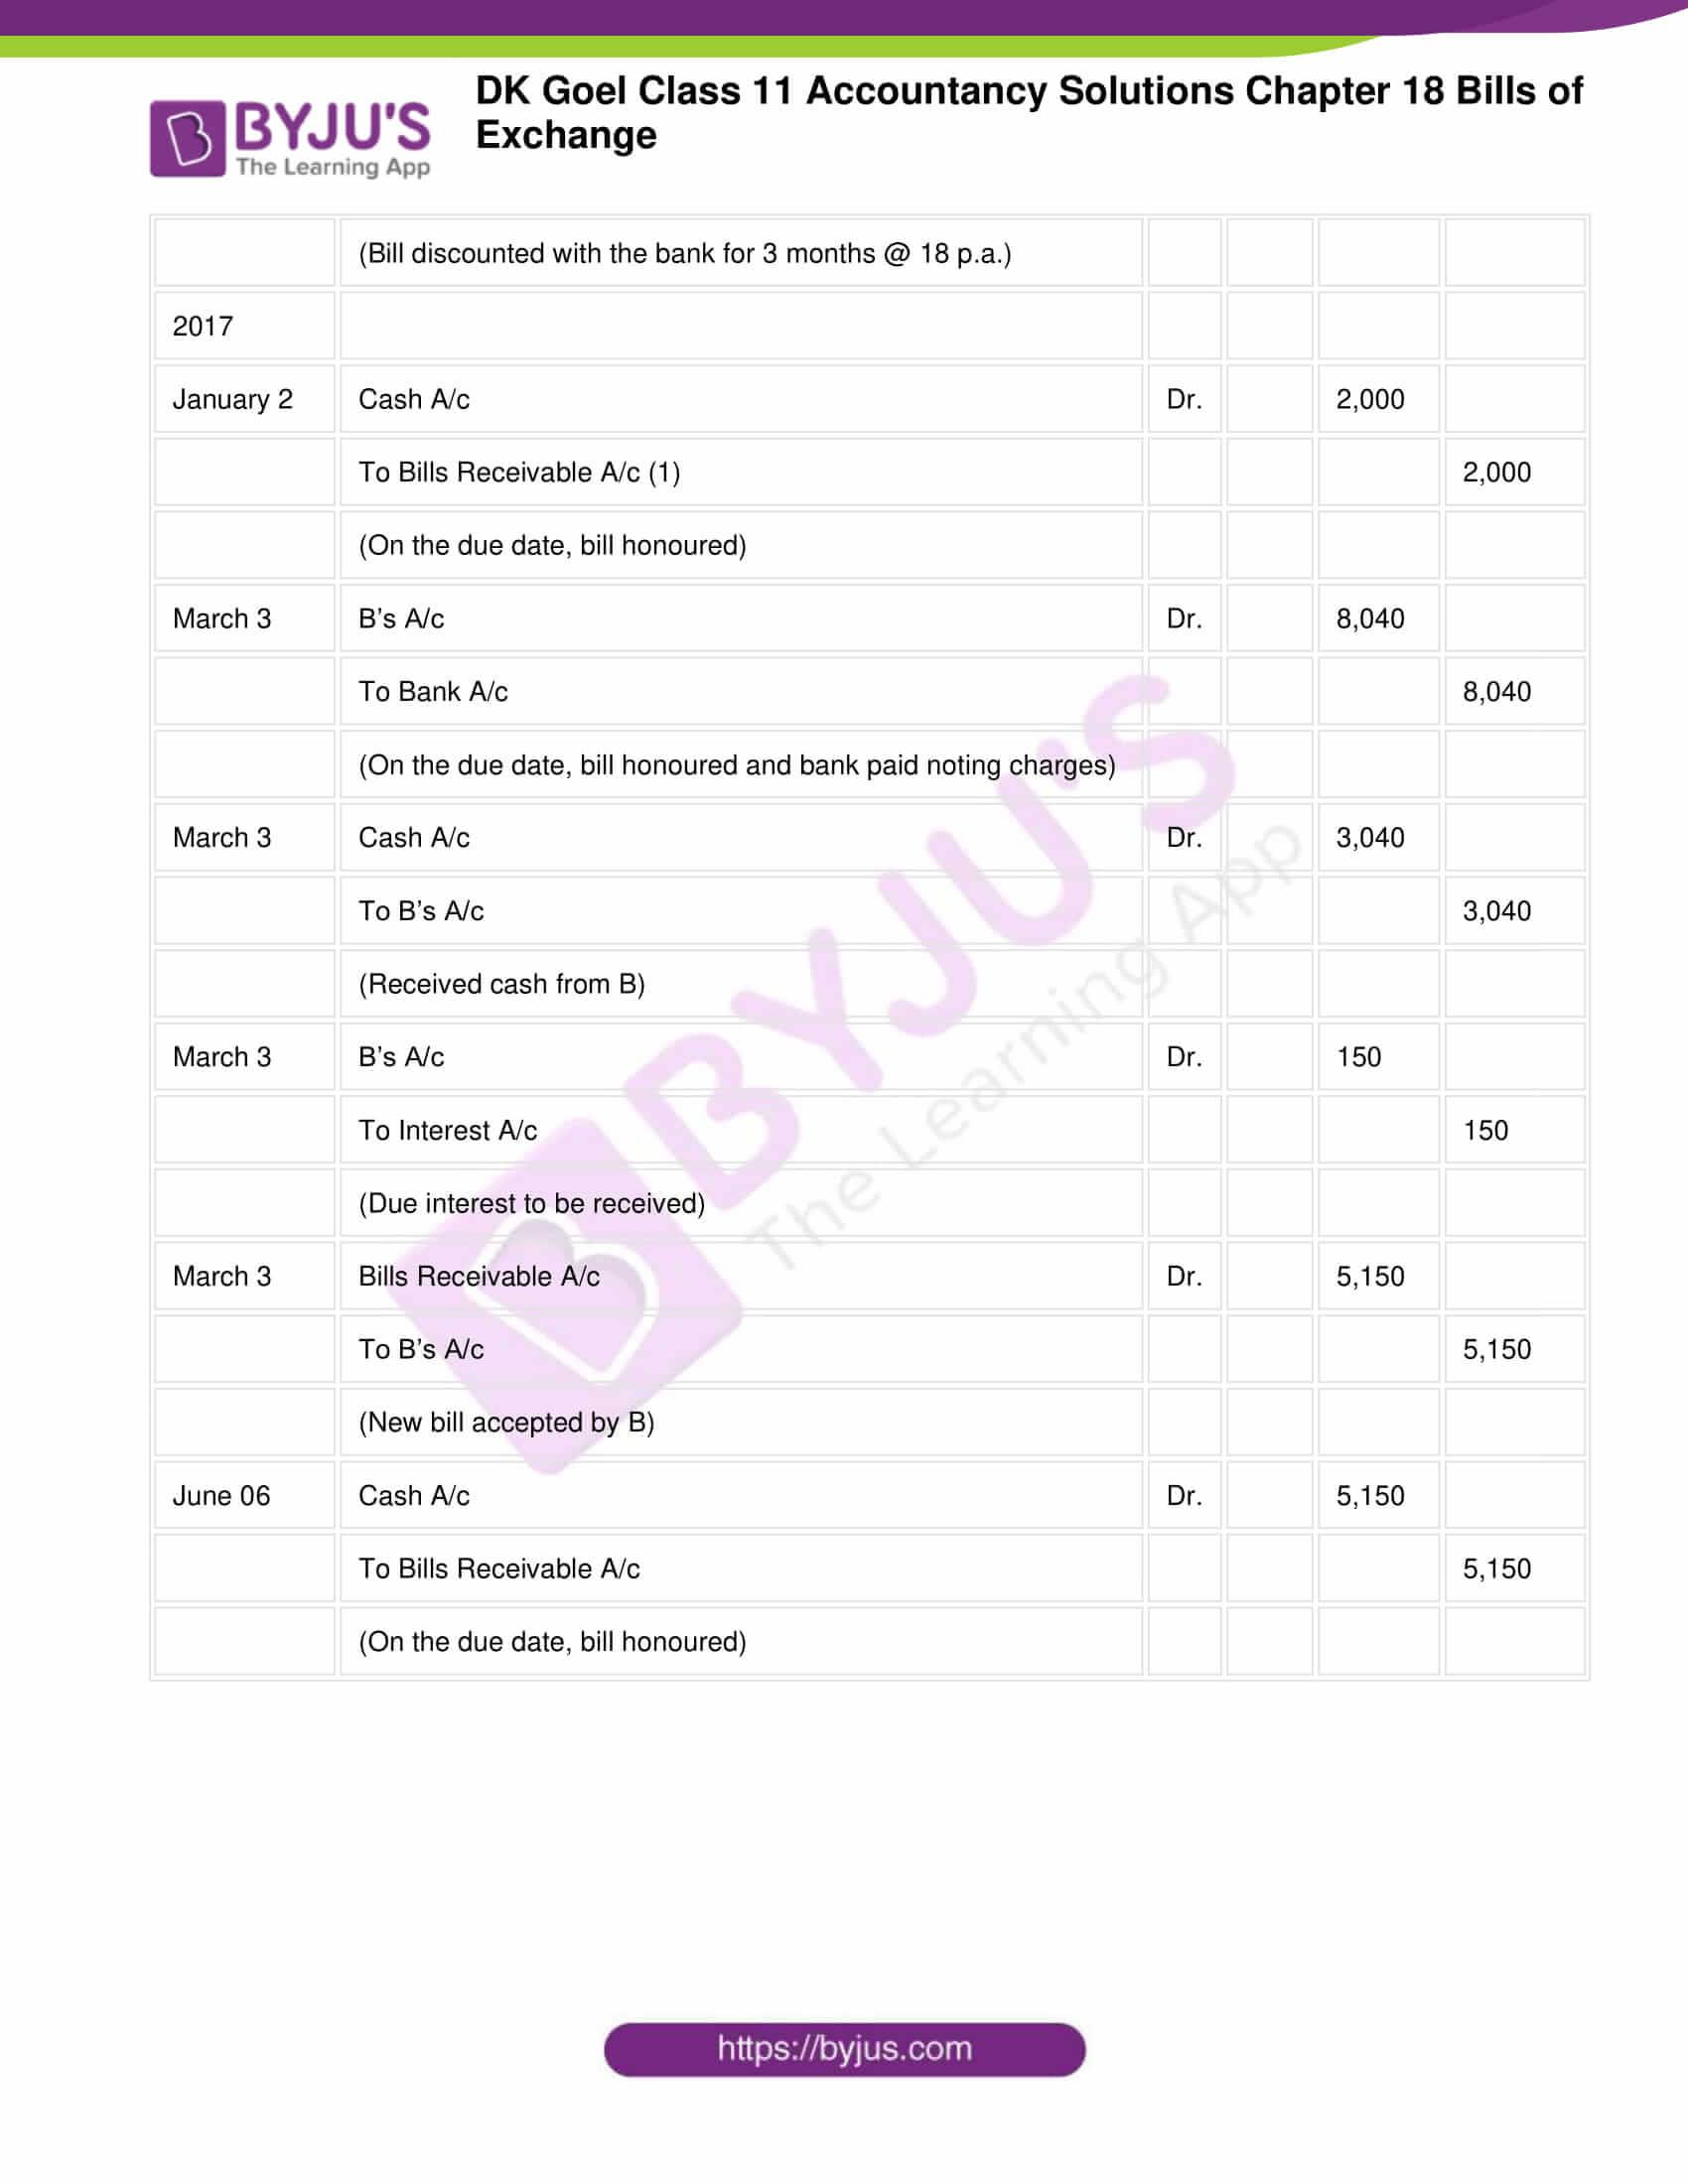 dk goel class 11 accountancy solutions chapter 18 077